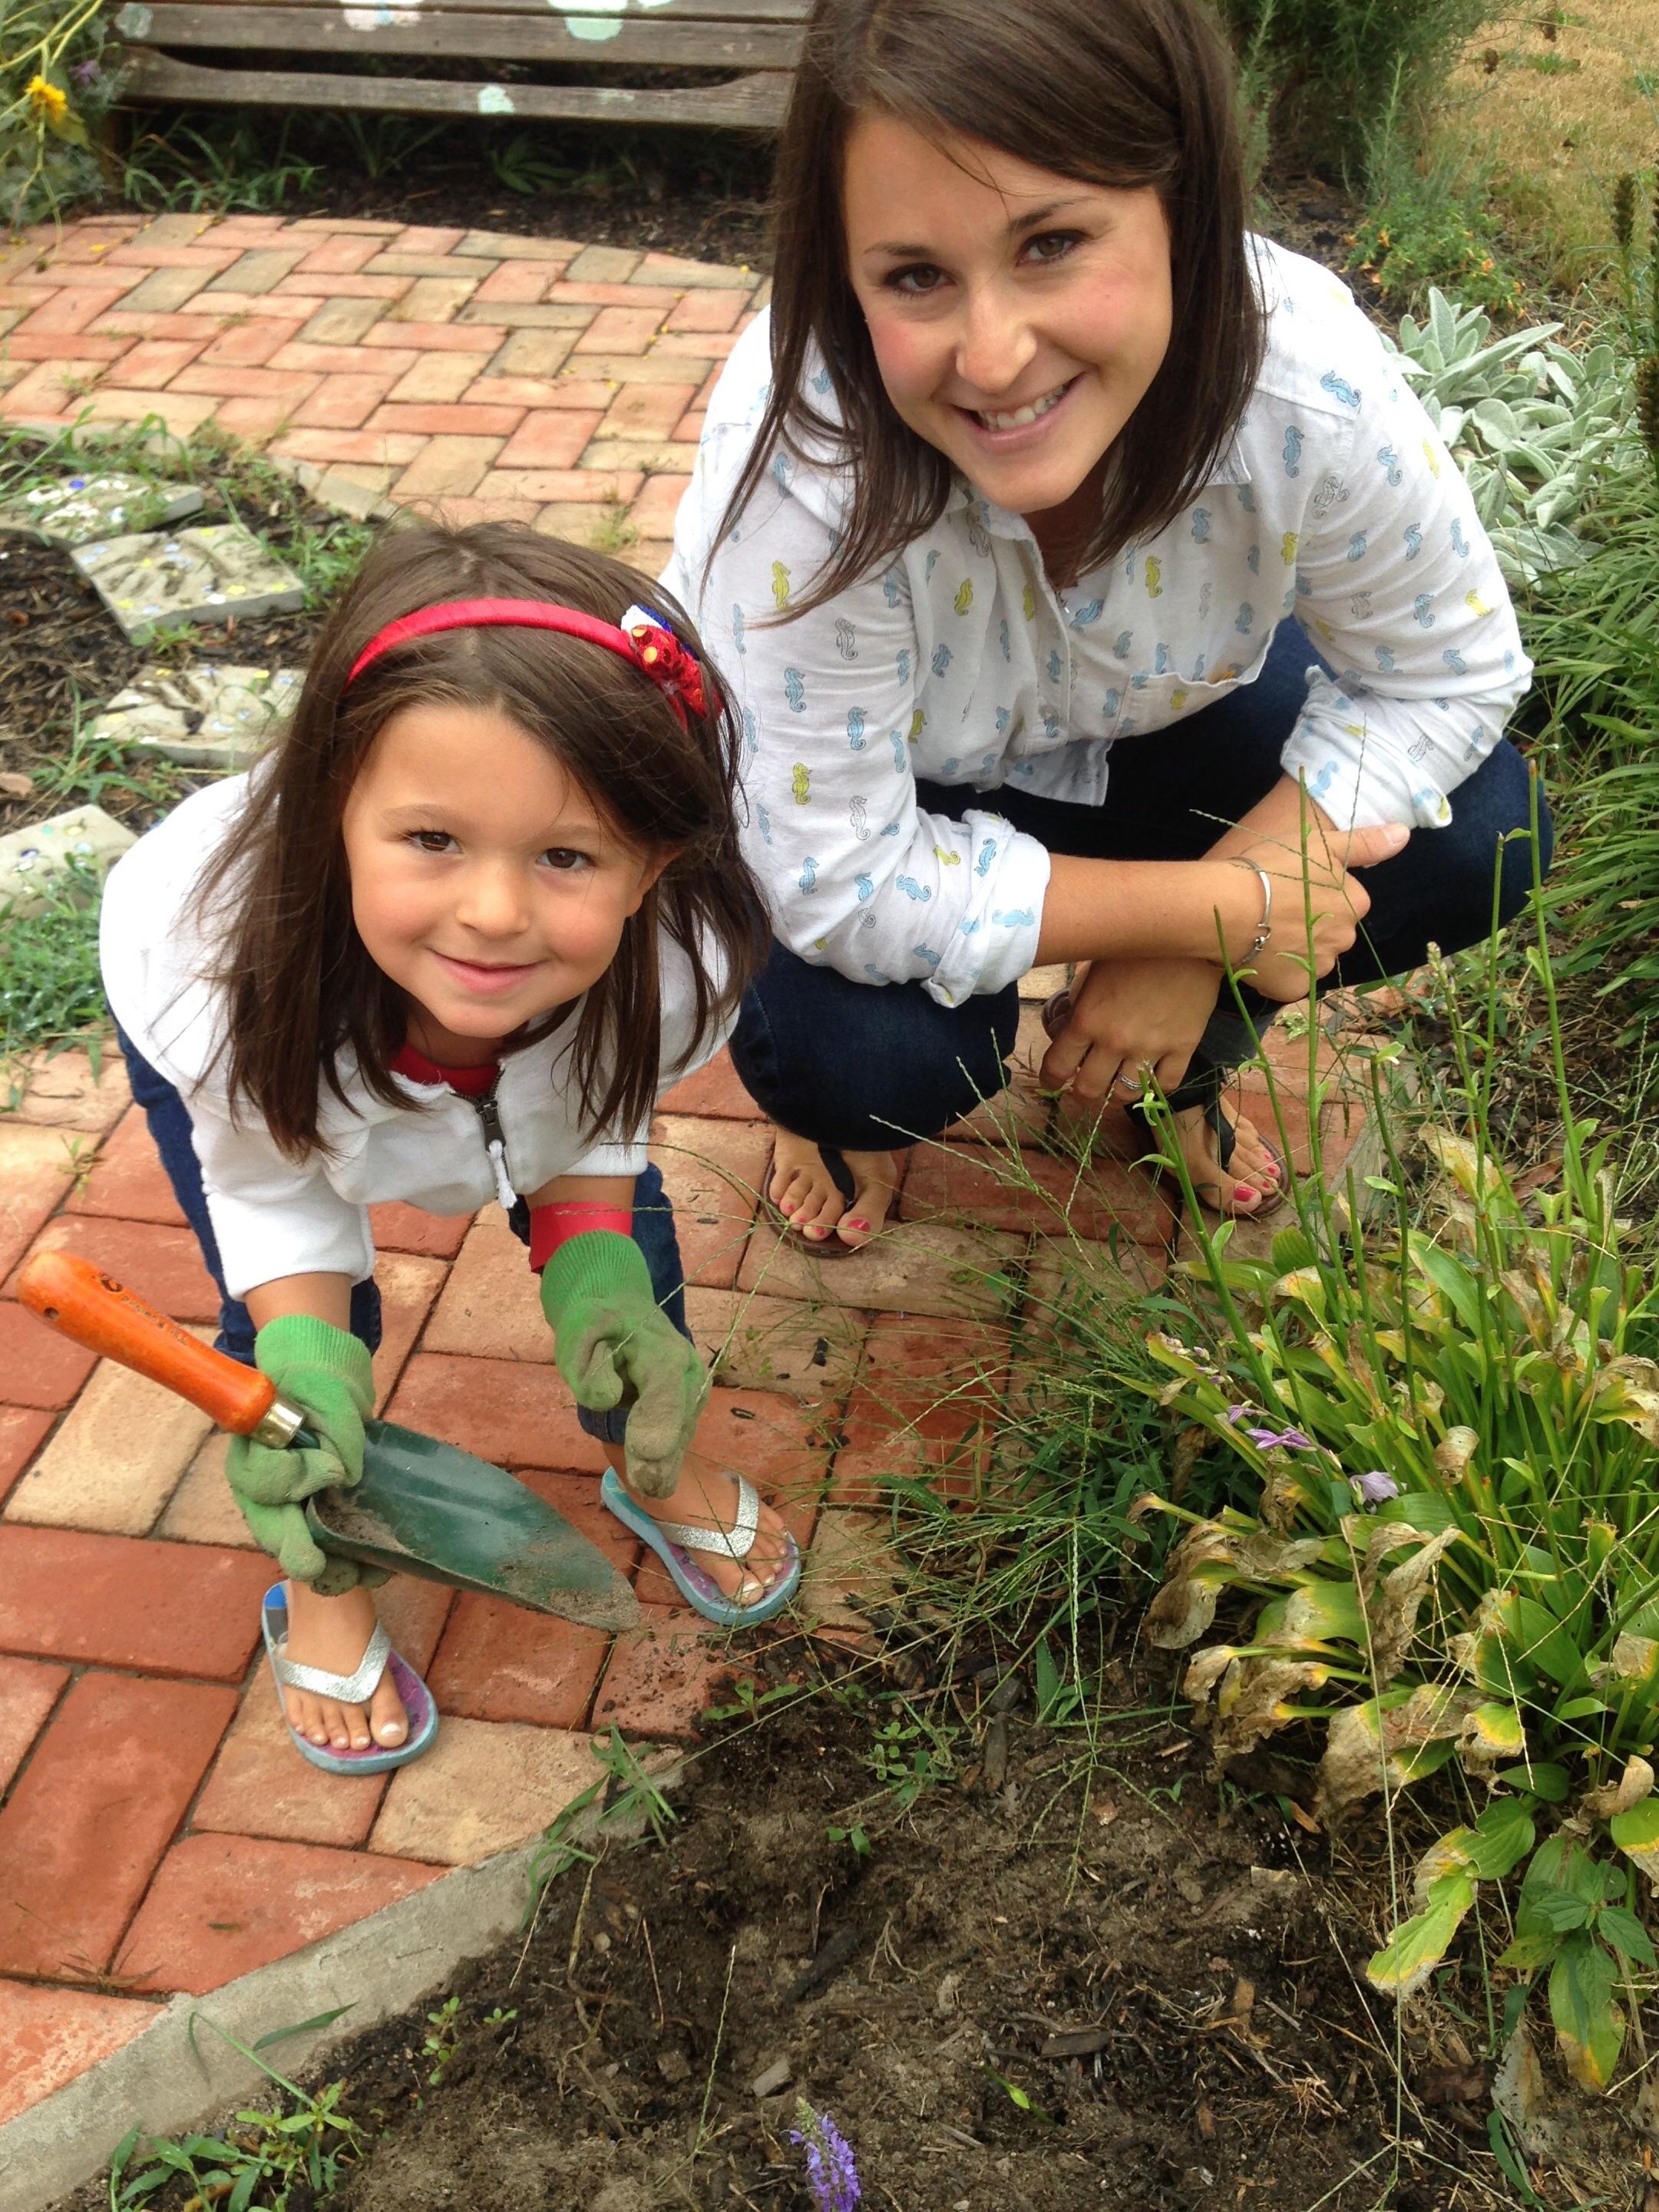 Mrs. Pollina and Alexa work in the Centennial Garden